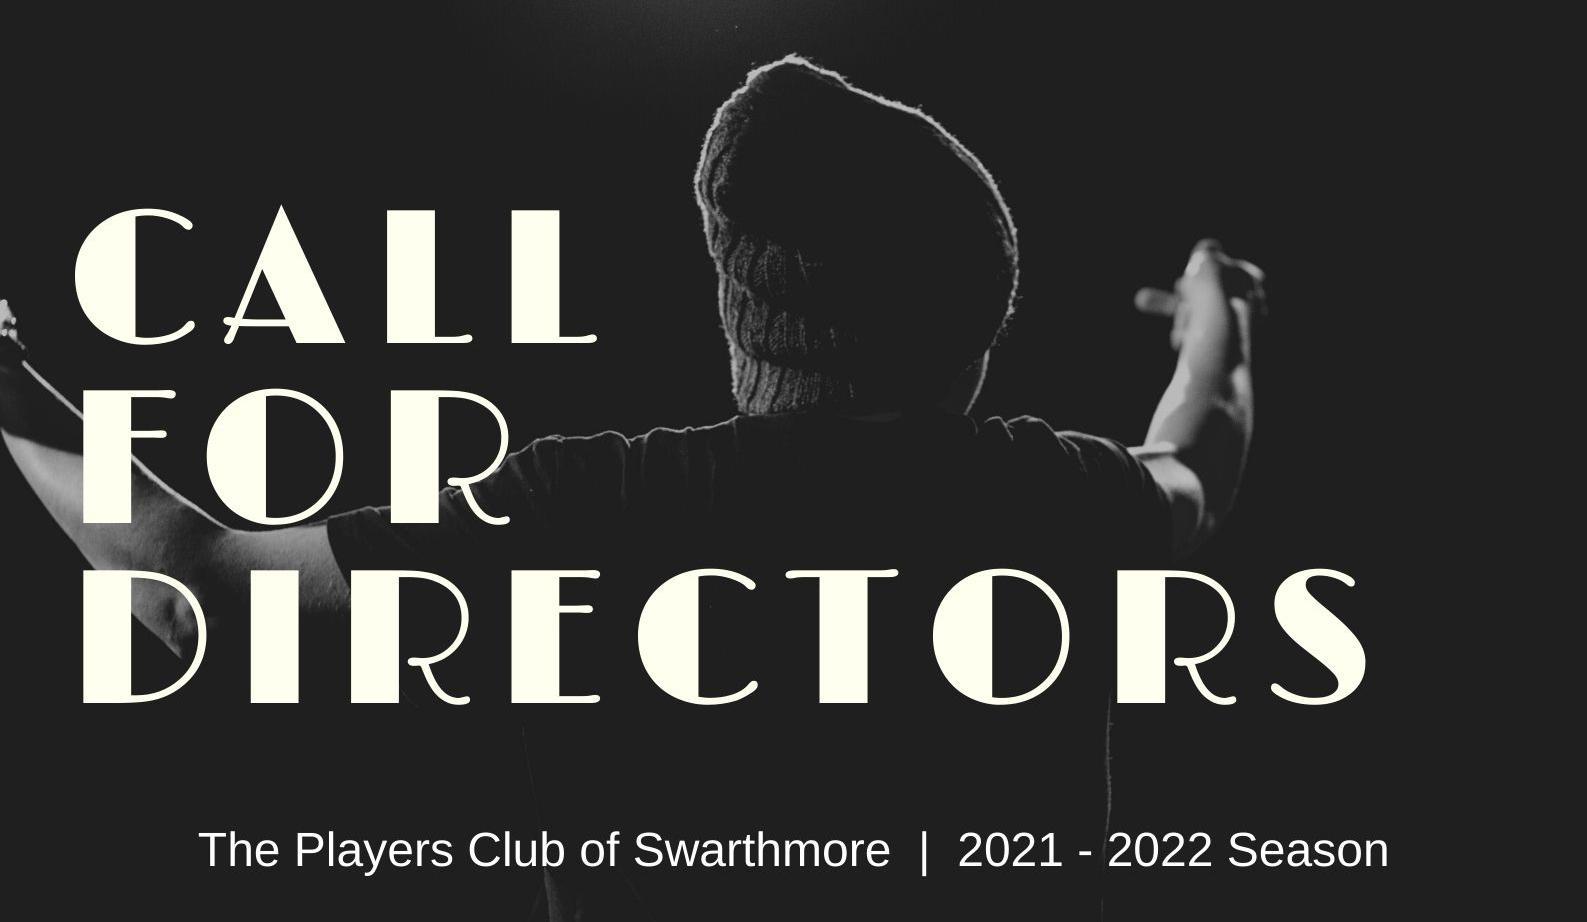 Swarthmore Calendar 2021 Players Club of Swarthmore – Swarthmore, PA